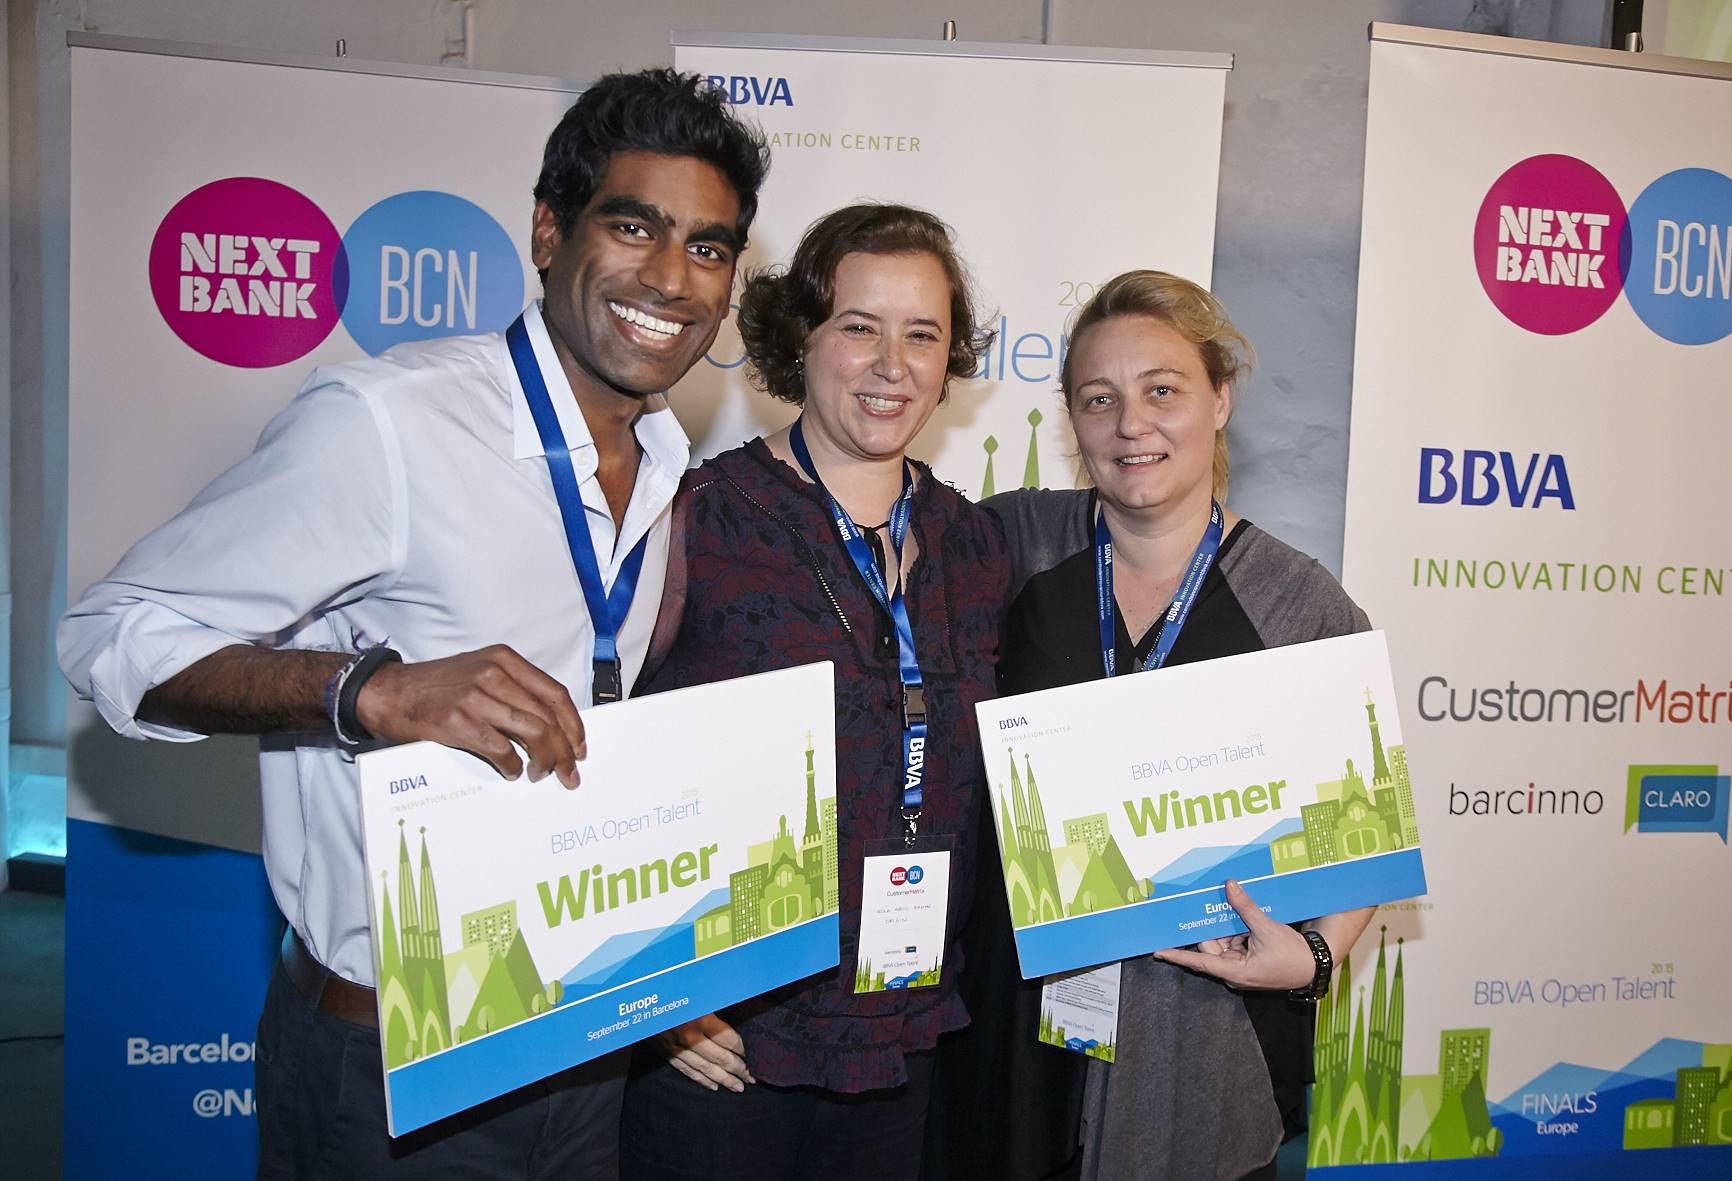 Picture of Everledger and Origin Markets winners BBVA Open Talent Europe 2015